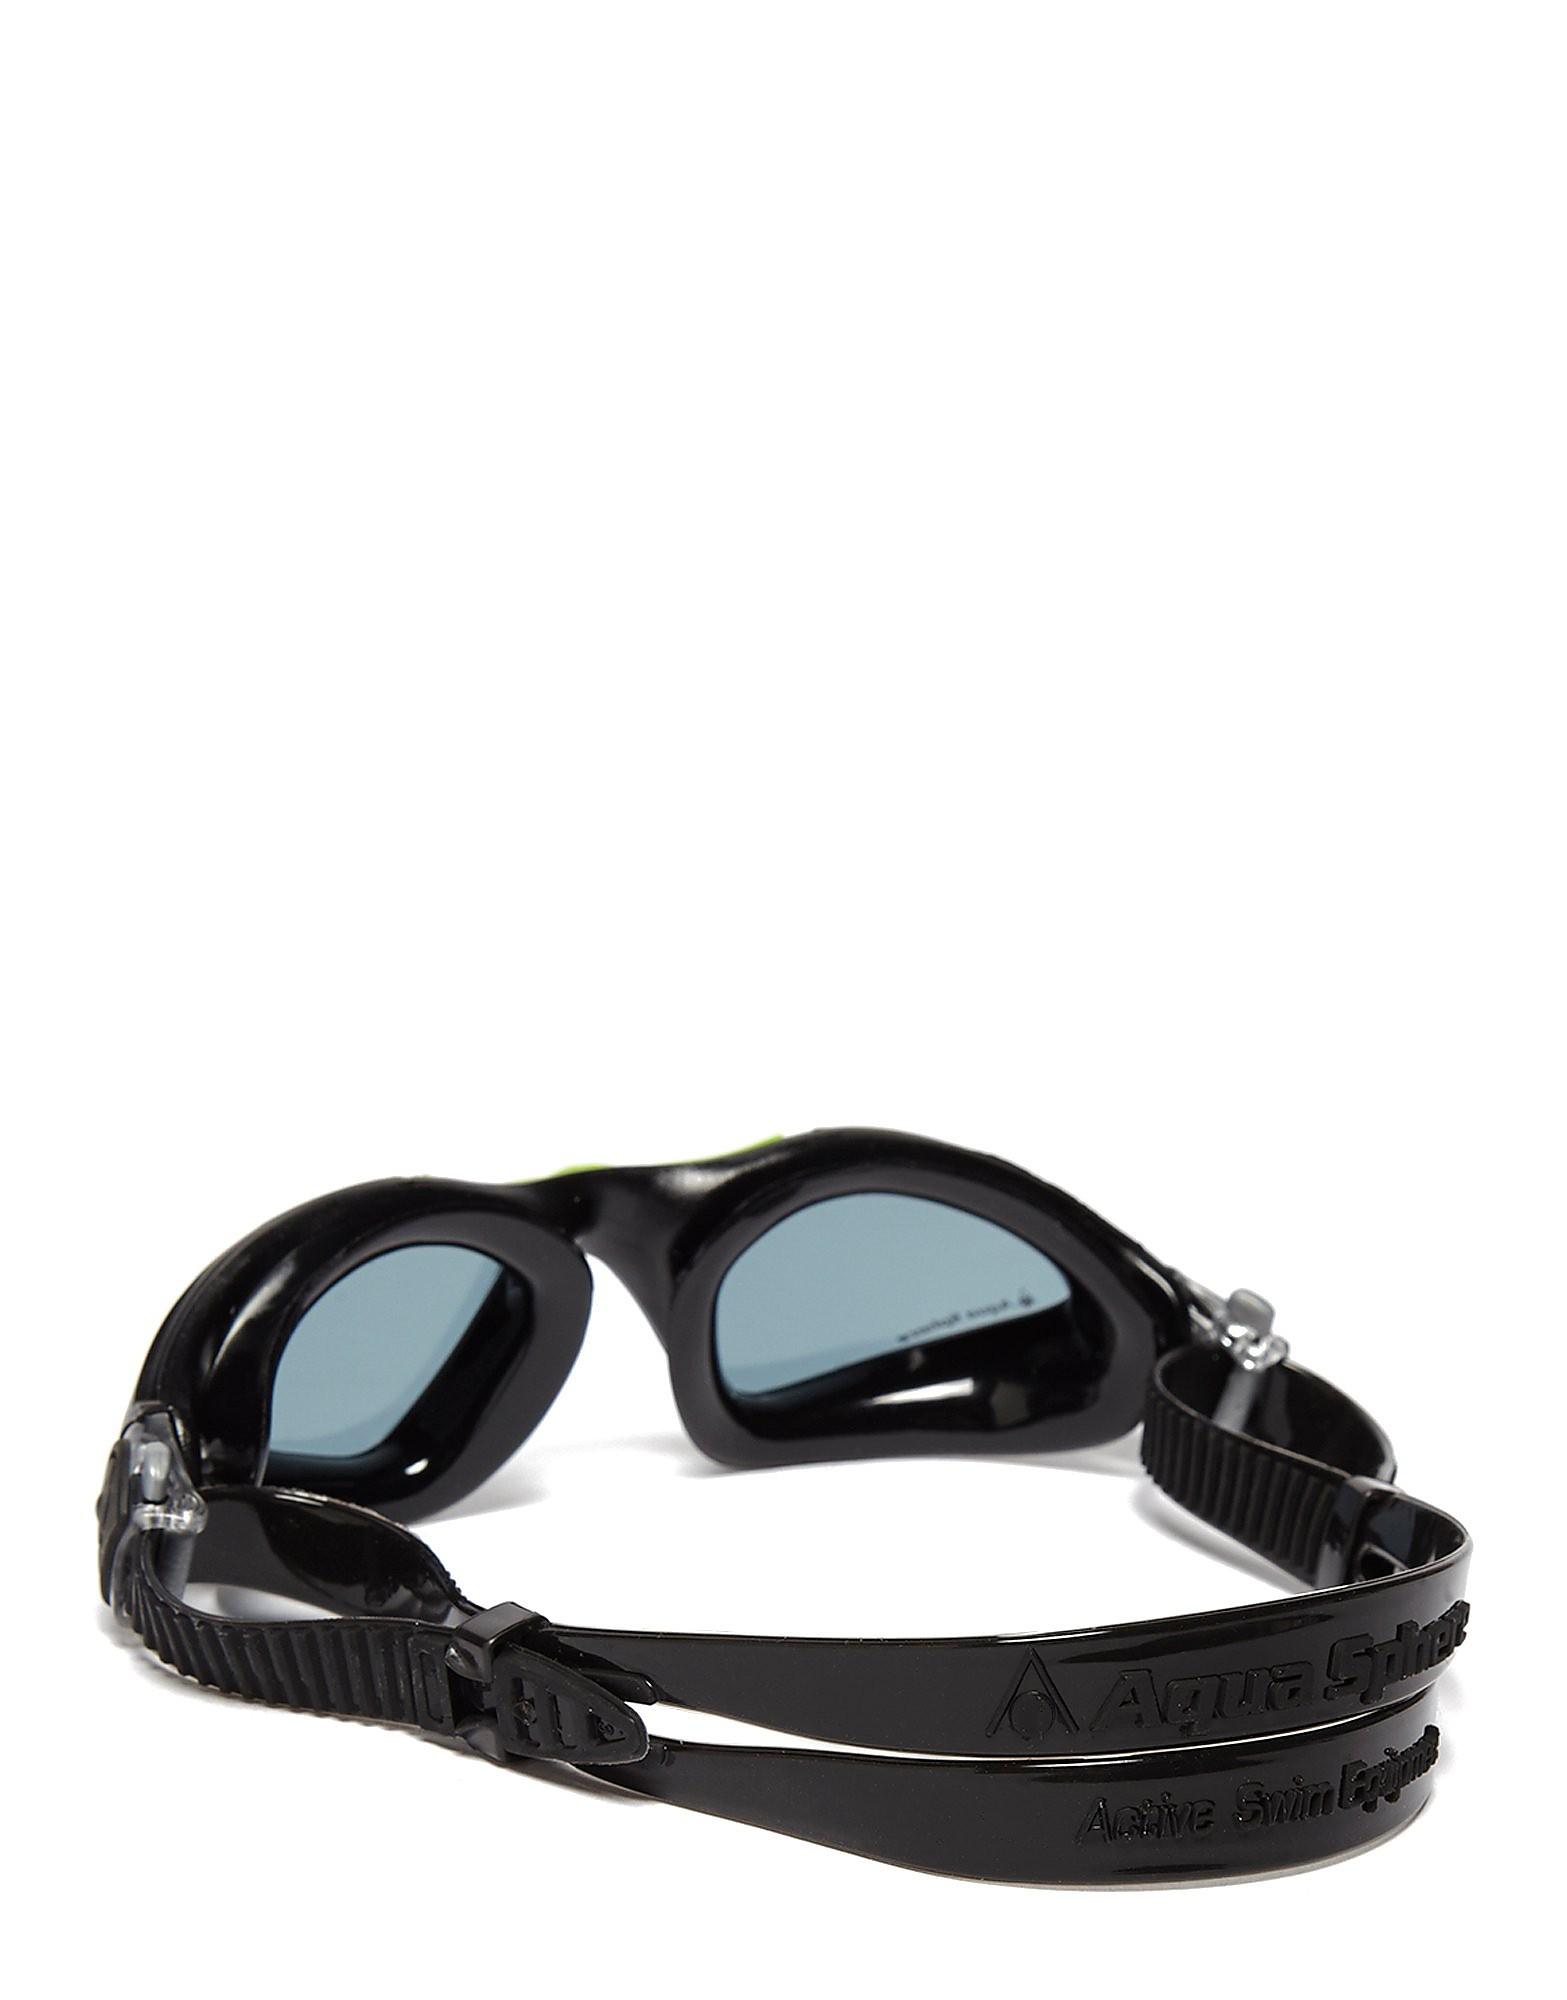 Aqua Sphere Kayenne Tinted Lens Goggles